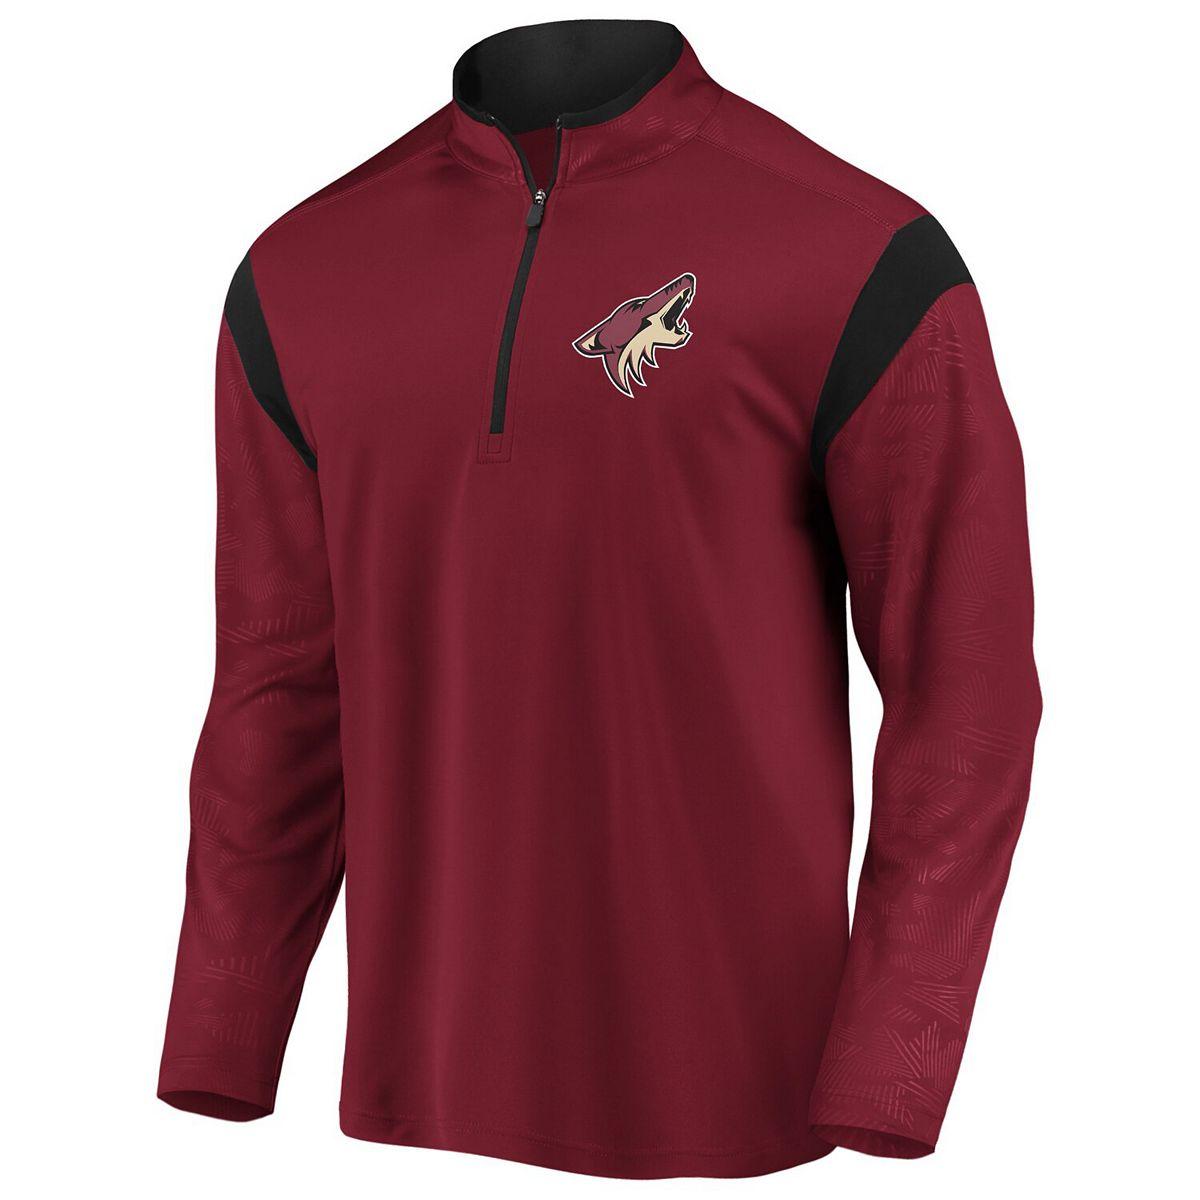 Men's Fanatics Branded Garnet Arizona Coyotes Mission Half-Zip Pullover Jacket wNTm1